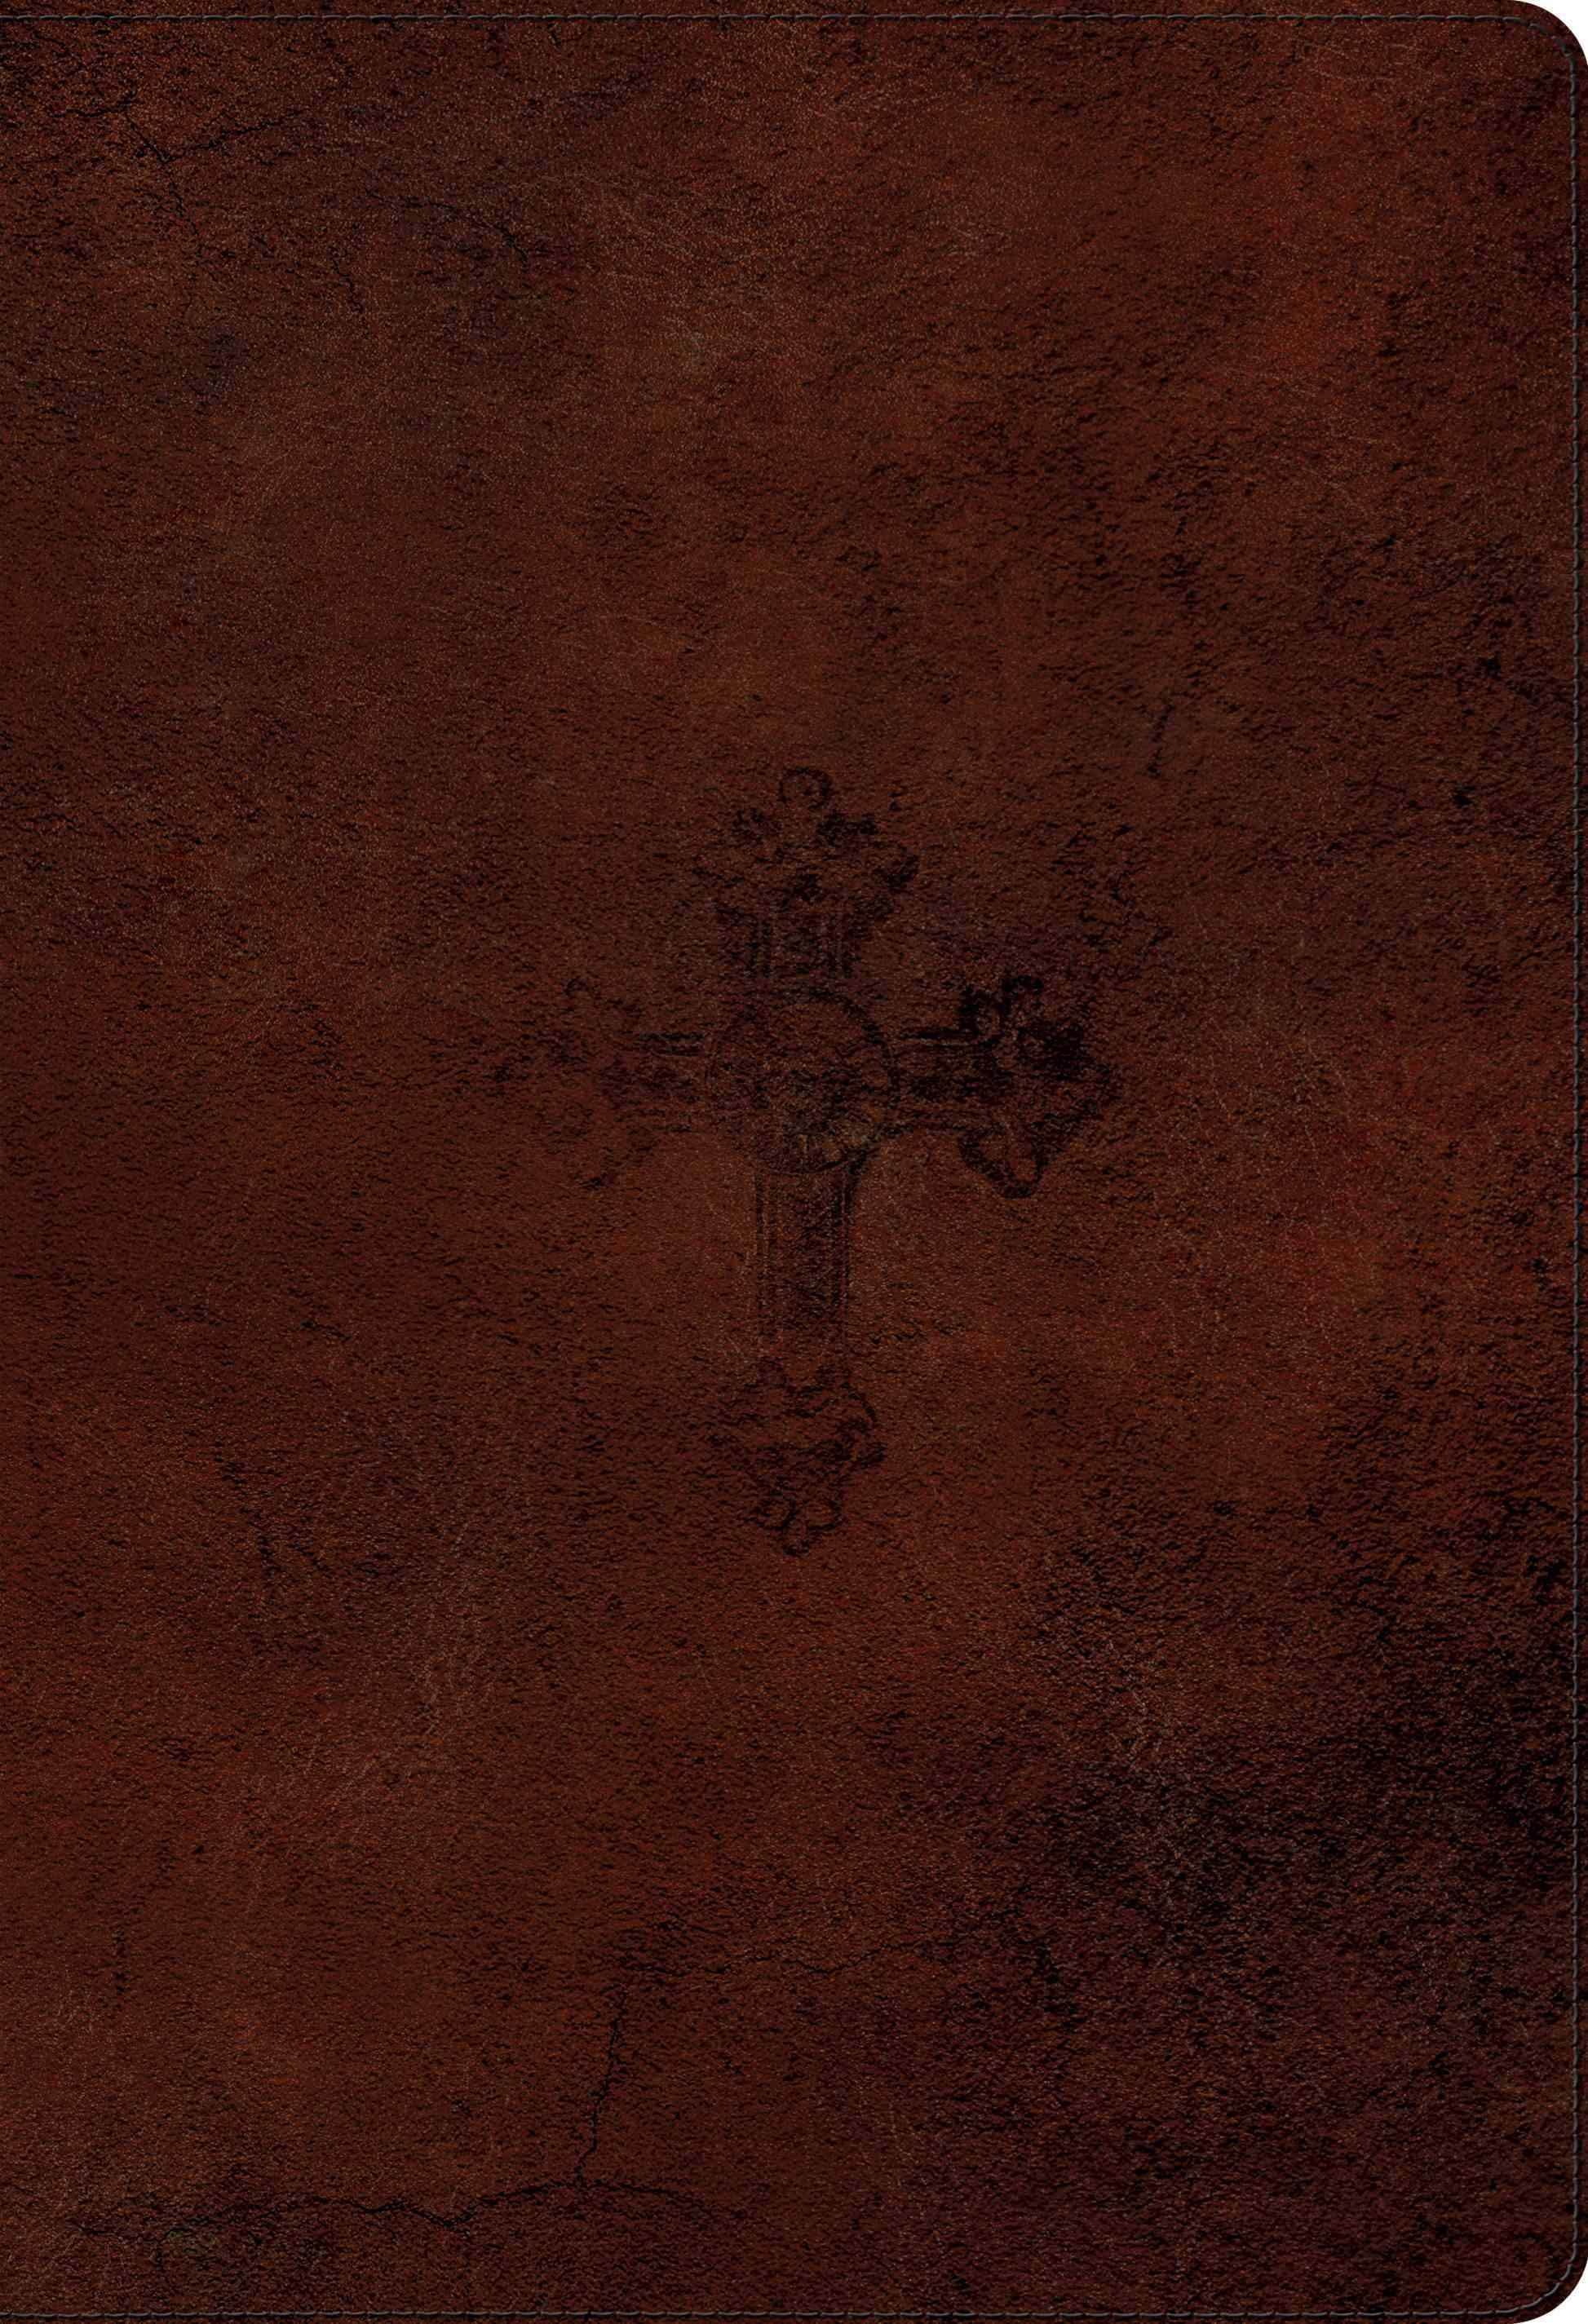 ESV Student Study Bible: English Standard Version, Walnut, Trutone, Weathered Cross Design